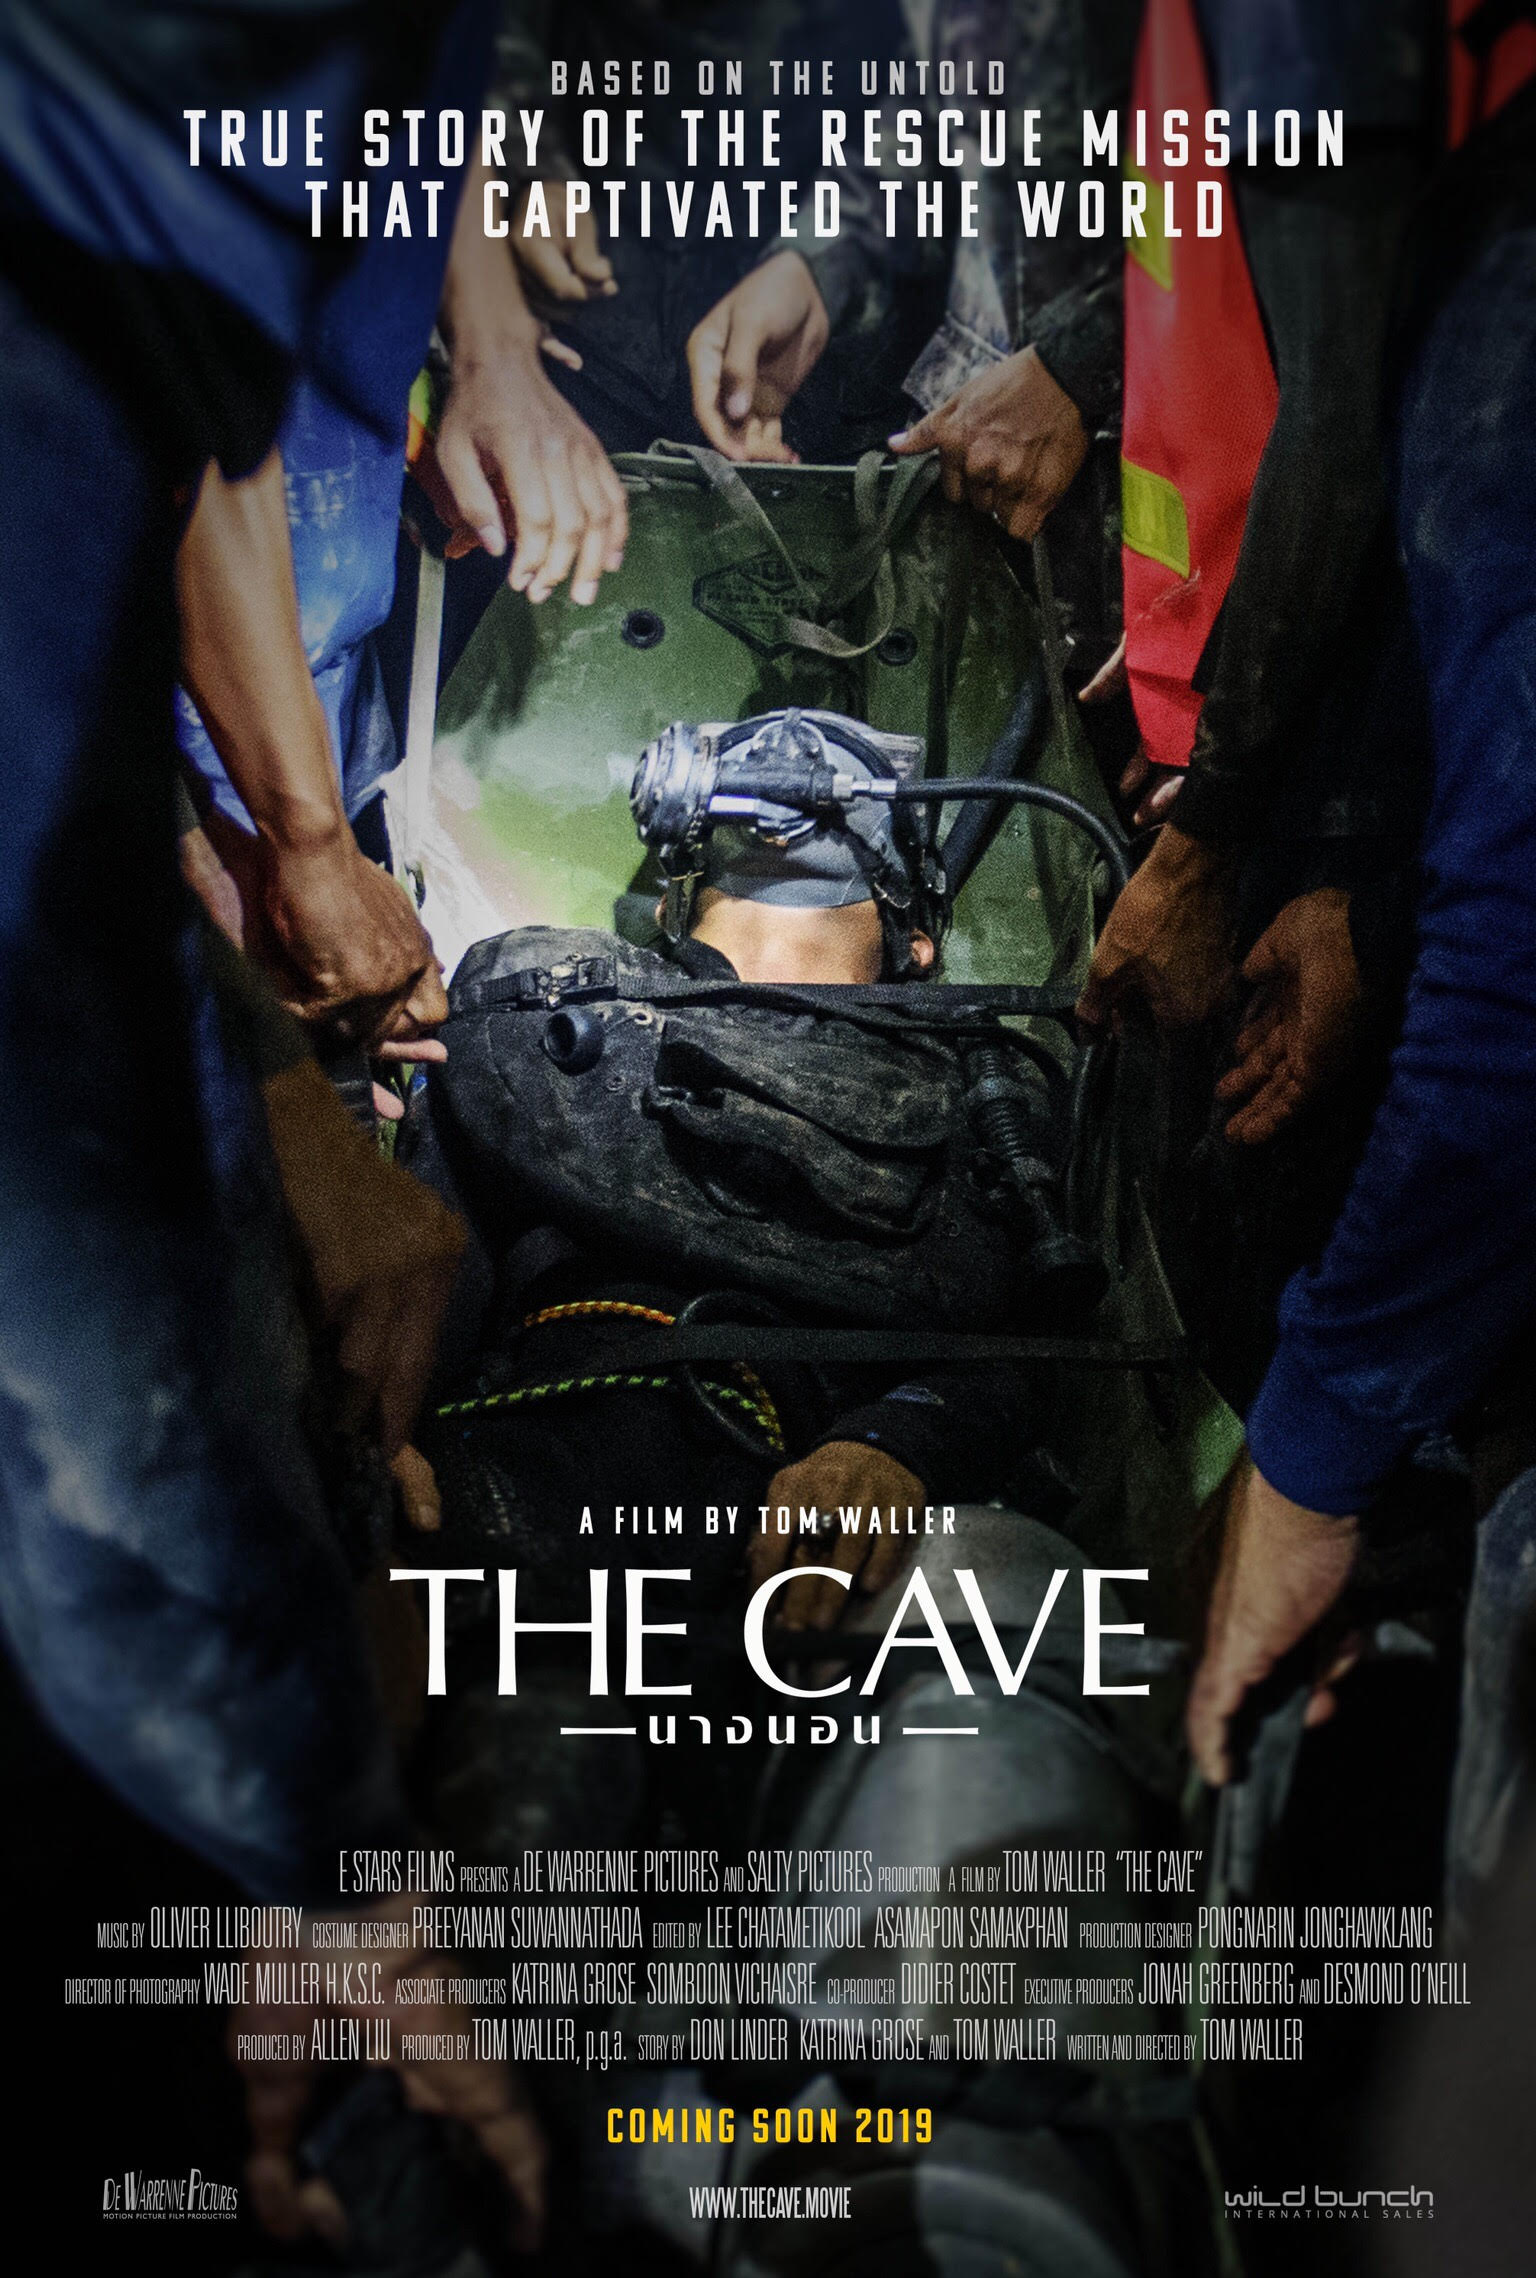 AW_THE_CAVE_1A_WEB.jpg